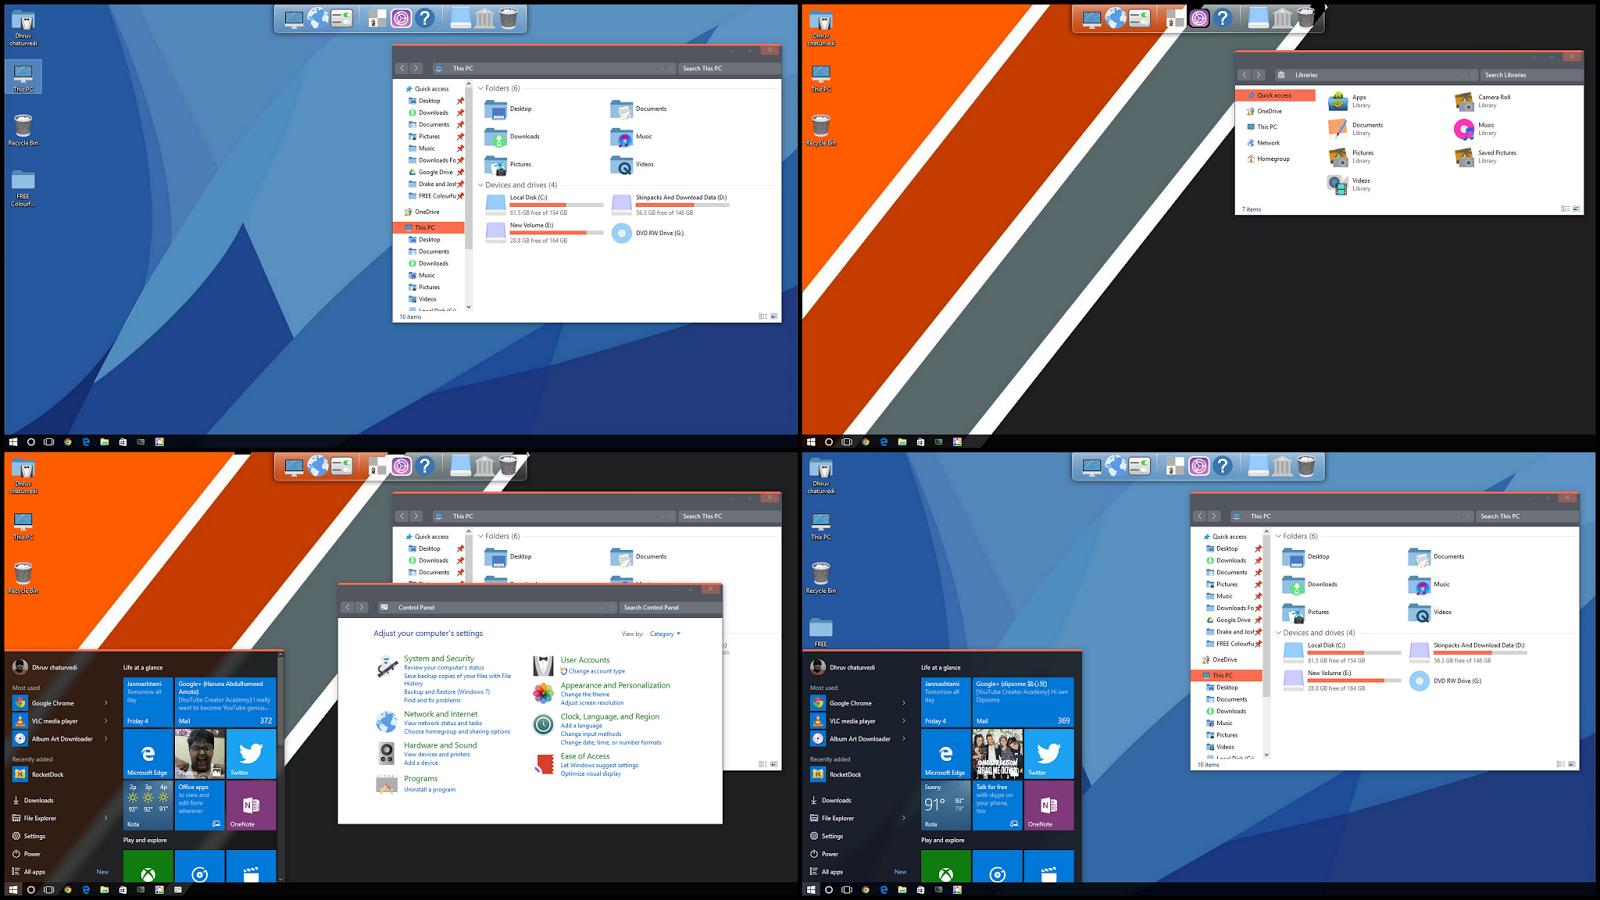 Google themes windows 10 - Google Themes Windows 10 13